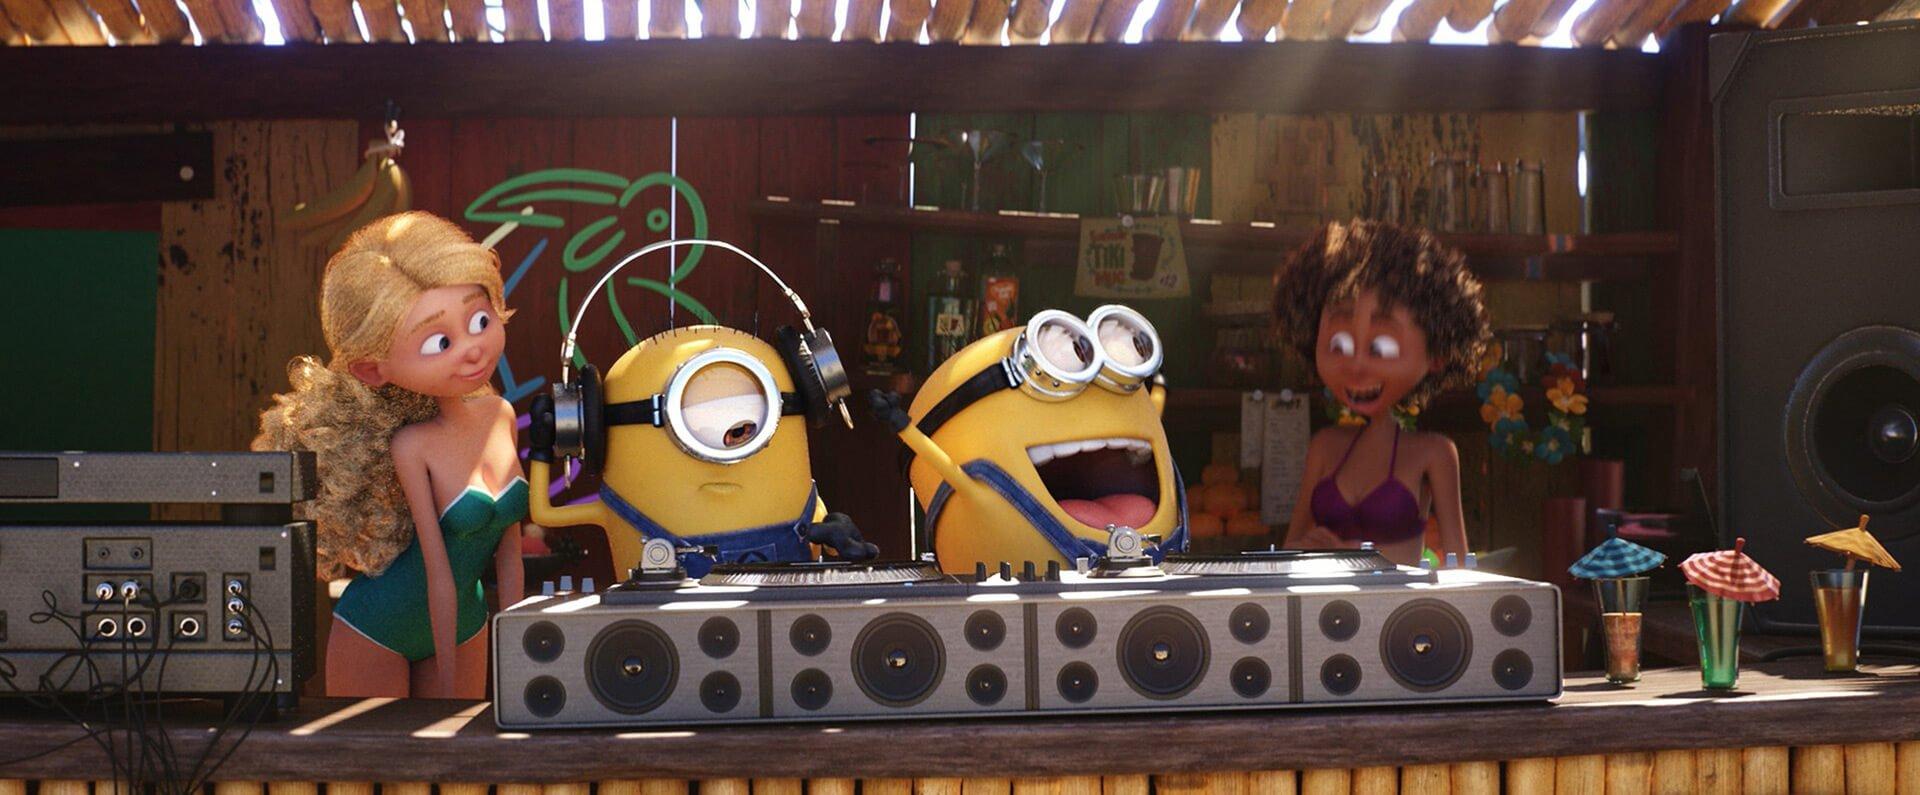 Despicable Me 3 Trailer Unveiled